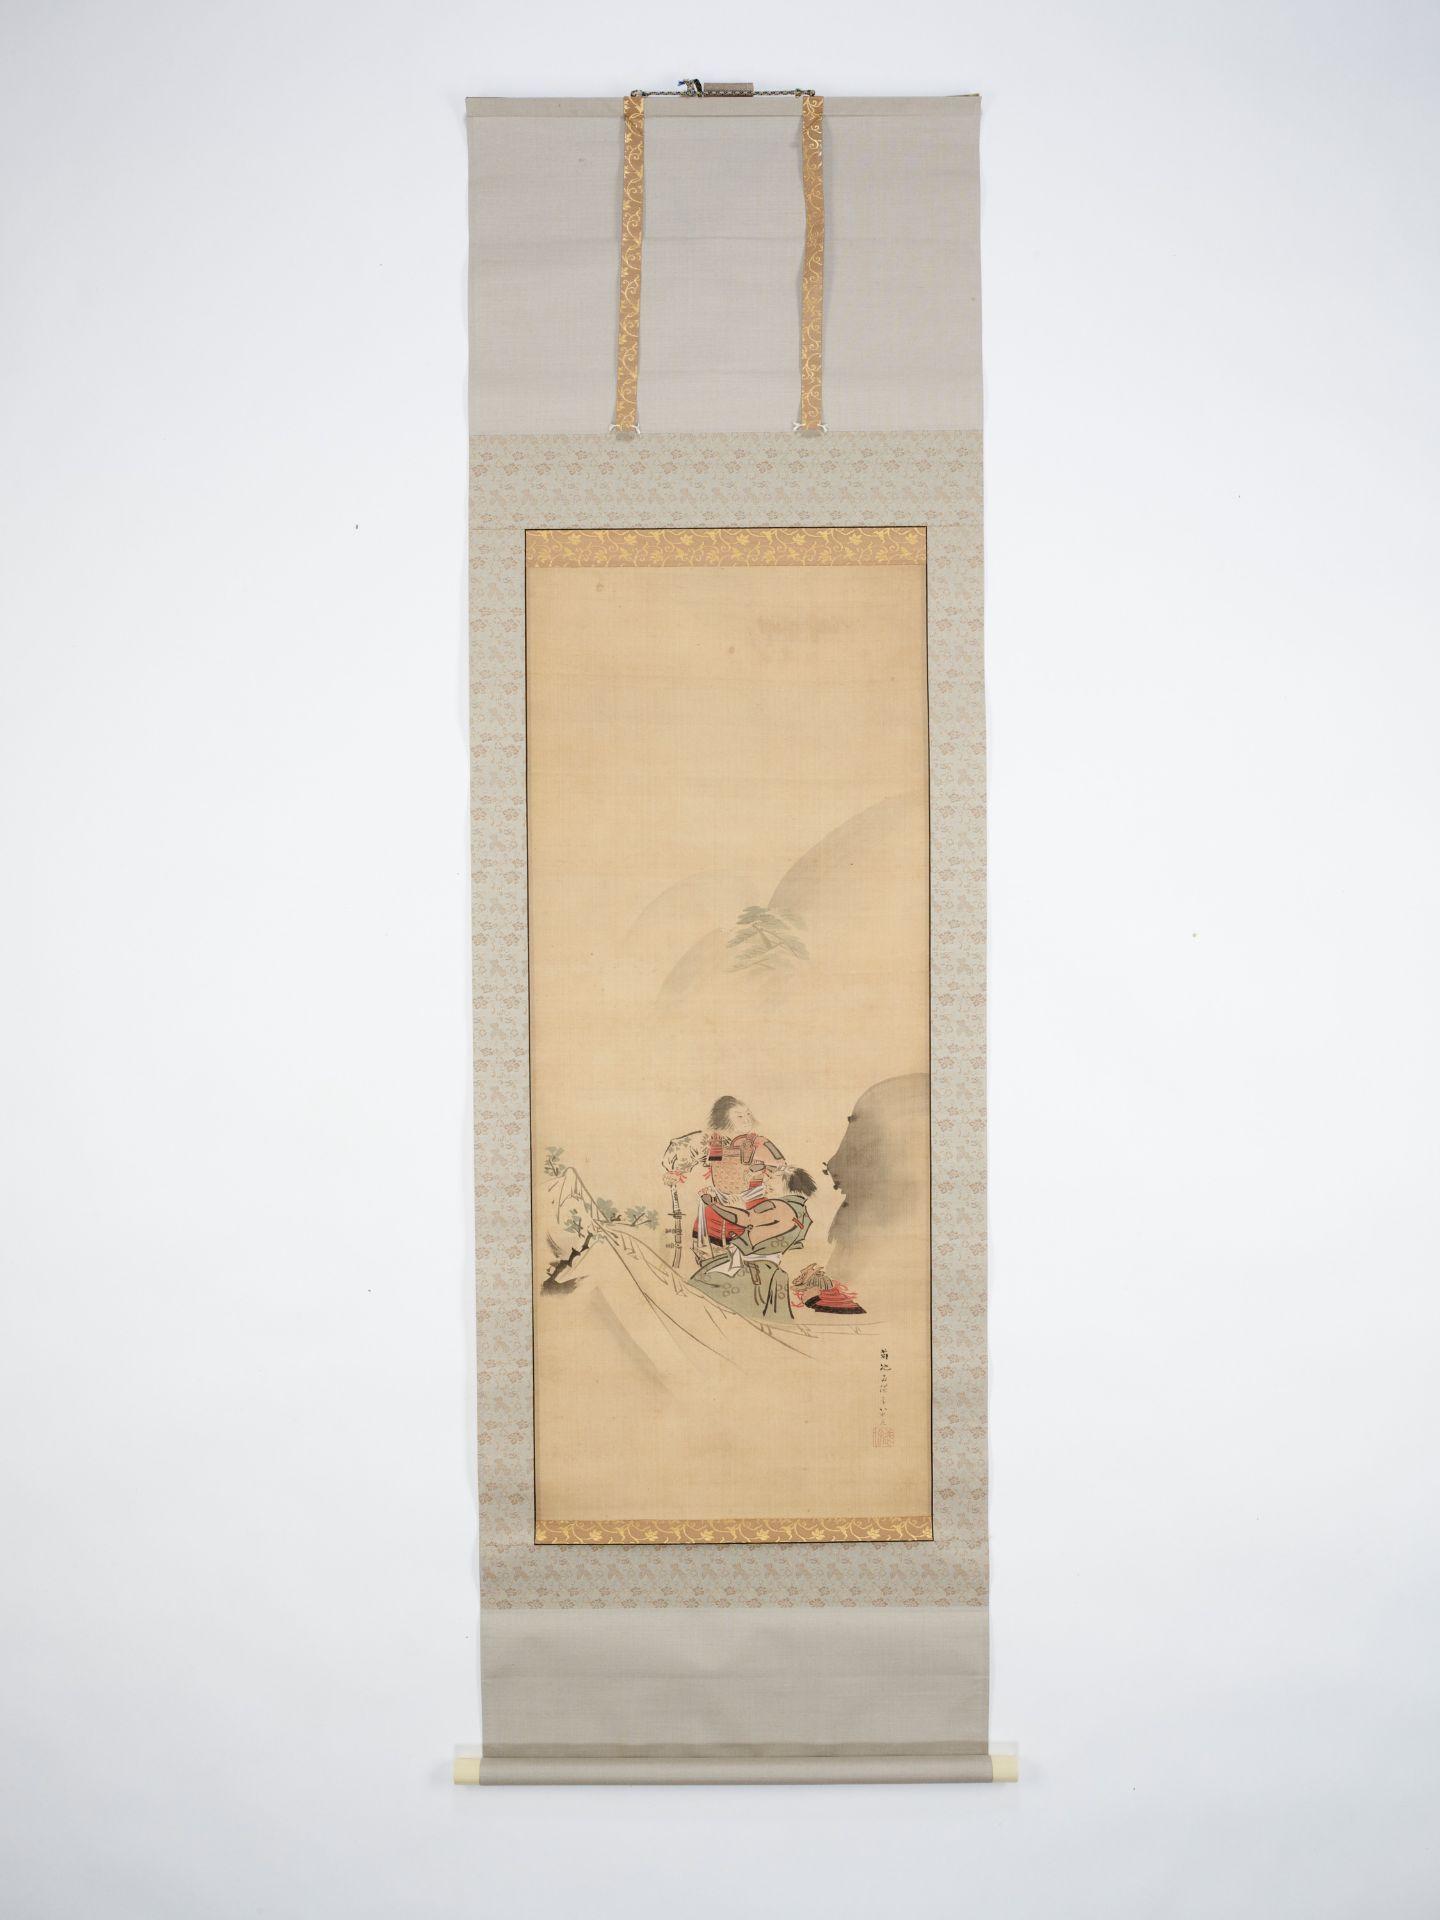 KIKUCHI YOSAI: A SCROLL PAINTING OF TWO SAMURAI IN THE MOUNTAINS - Image 3 of 5